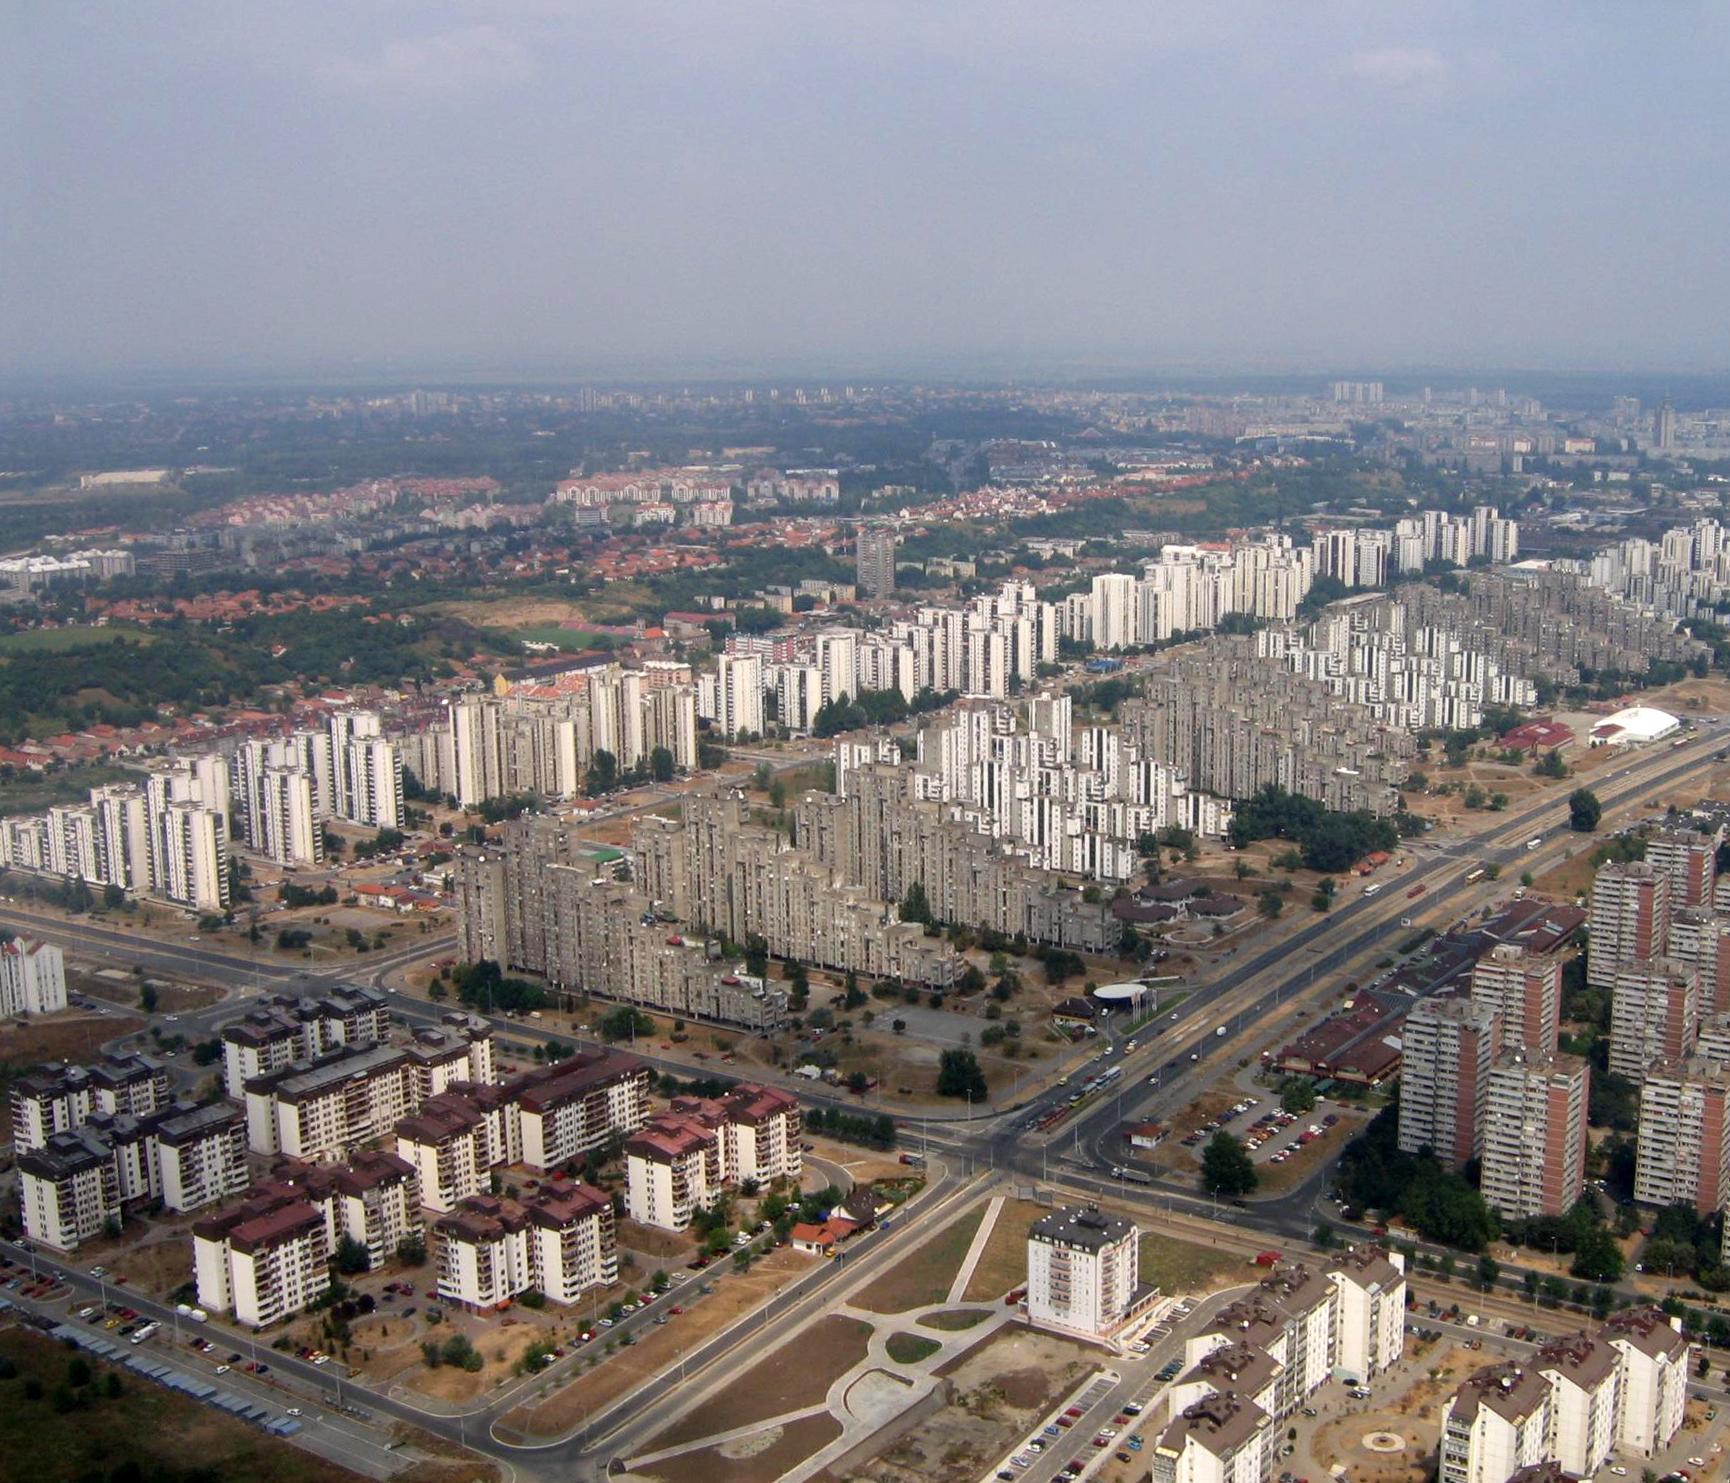 Gradovi i mesta uslikani iz vazduha - Page 11 Be%C5%BEanijski_Blokovi_EDIT